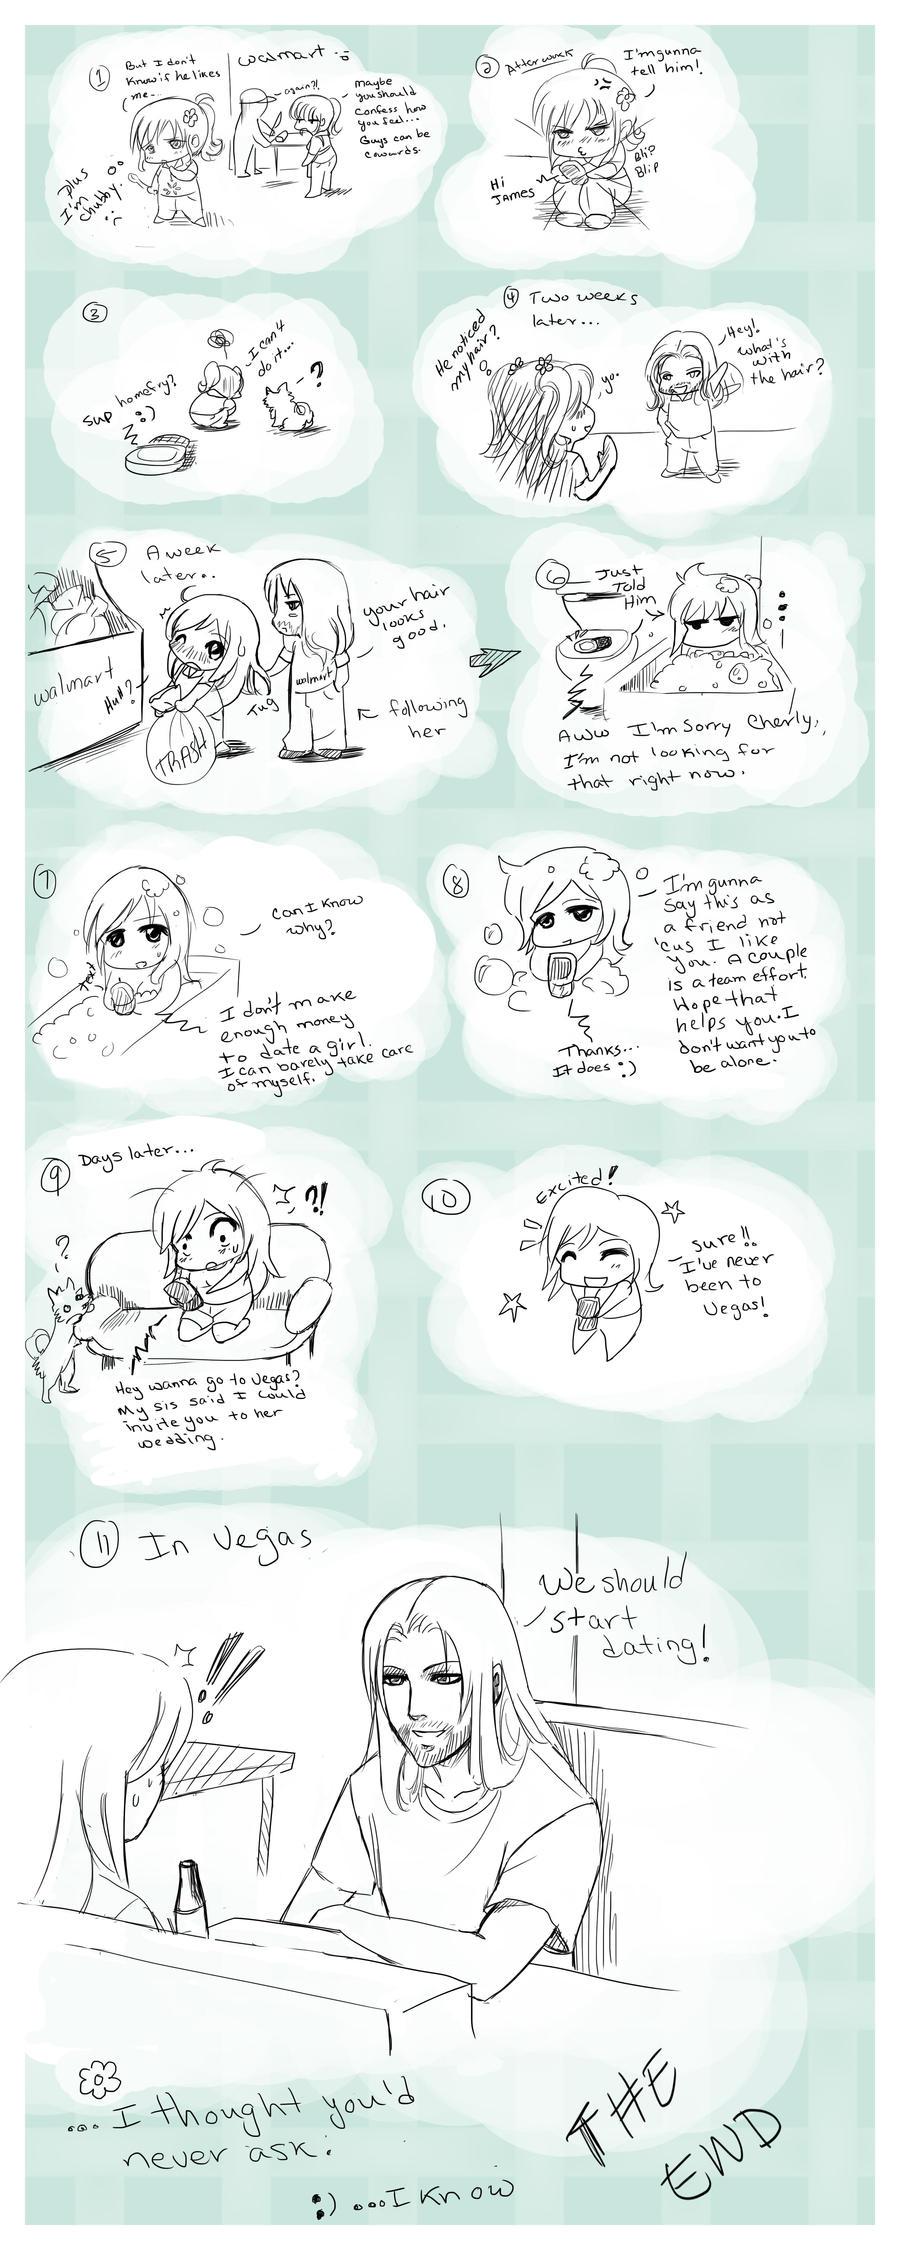 Short Comic Strip-A Silly Love Story 1 0:  by Nardhwen on